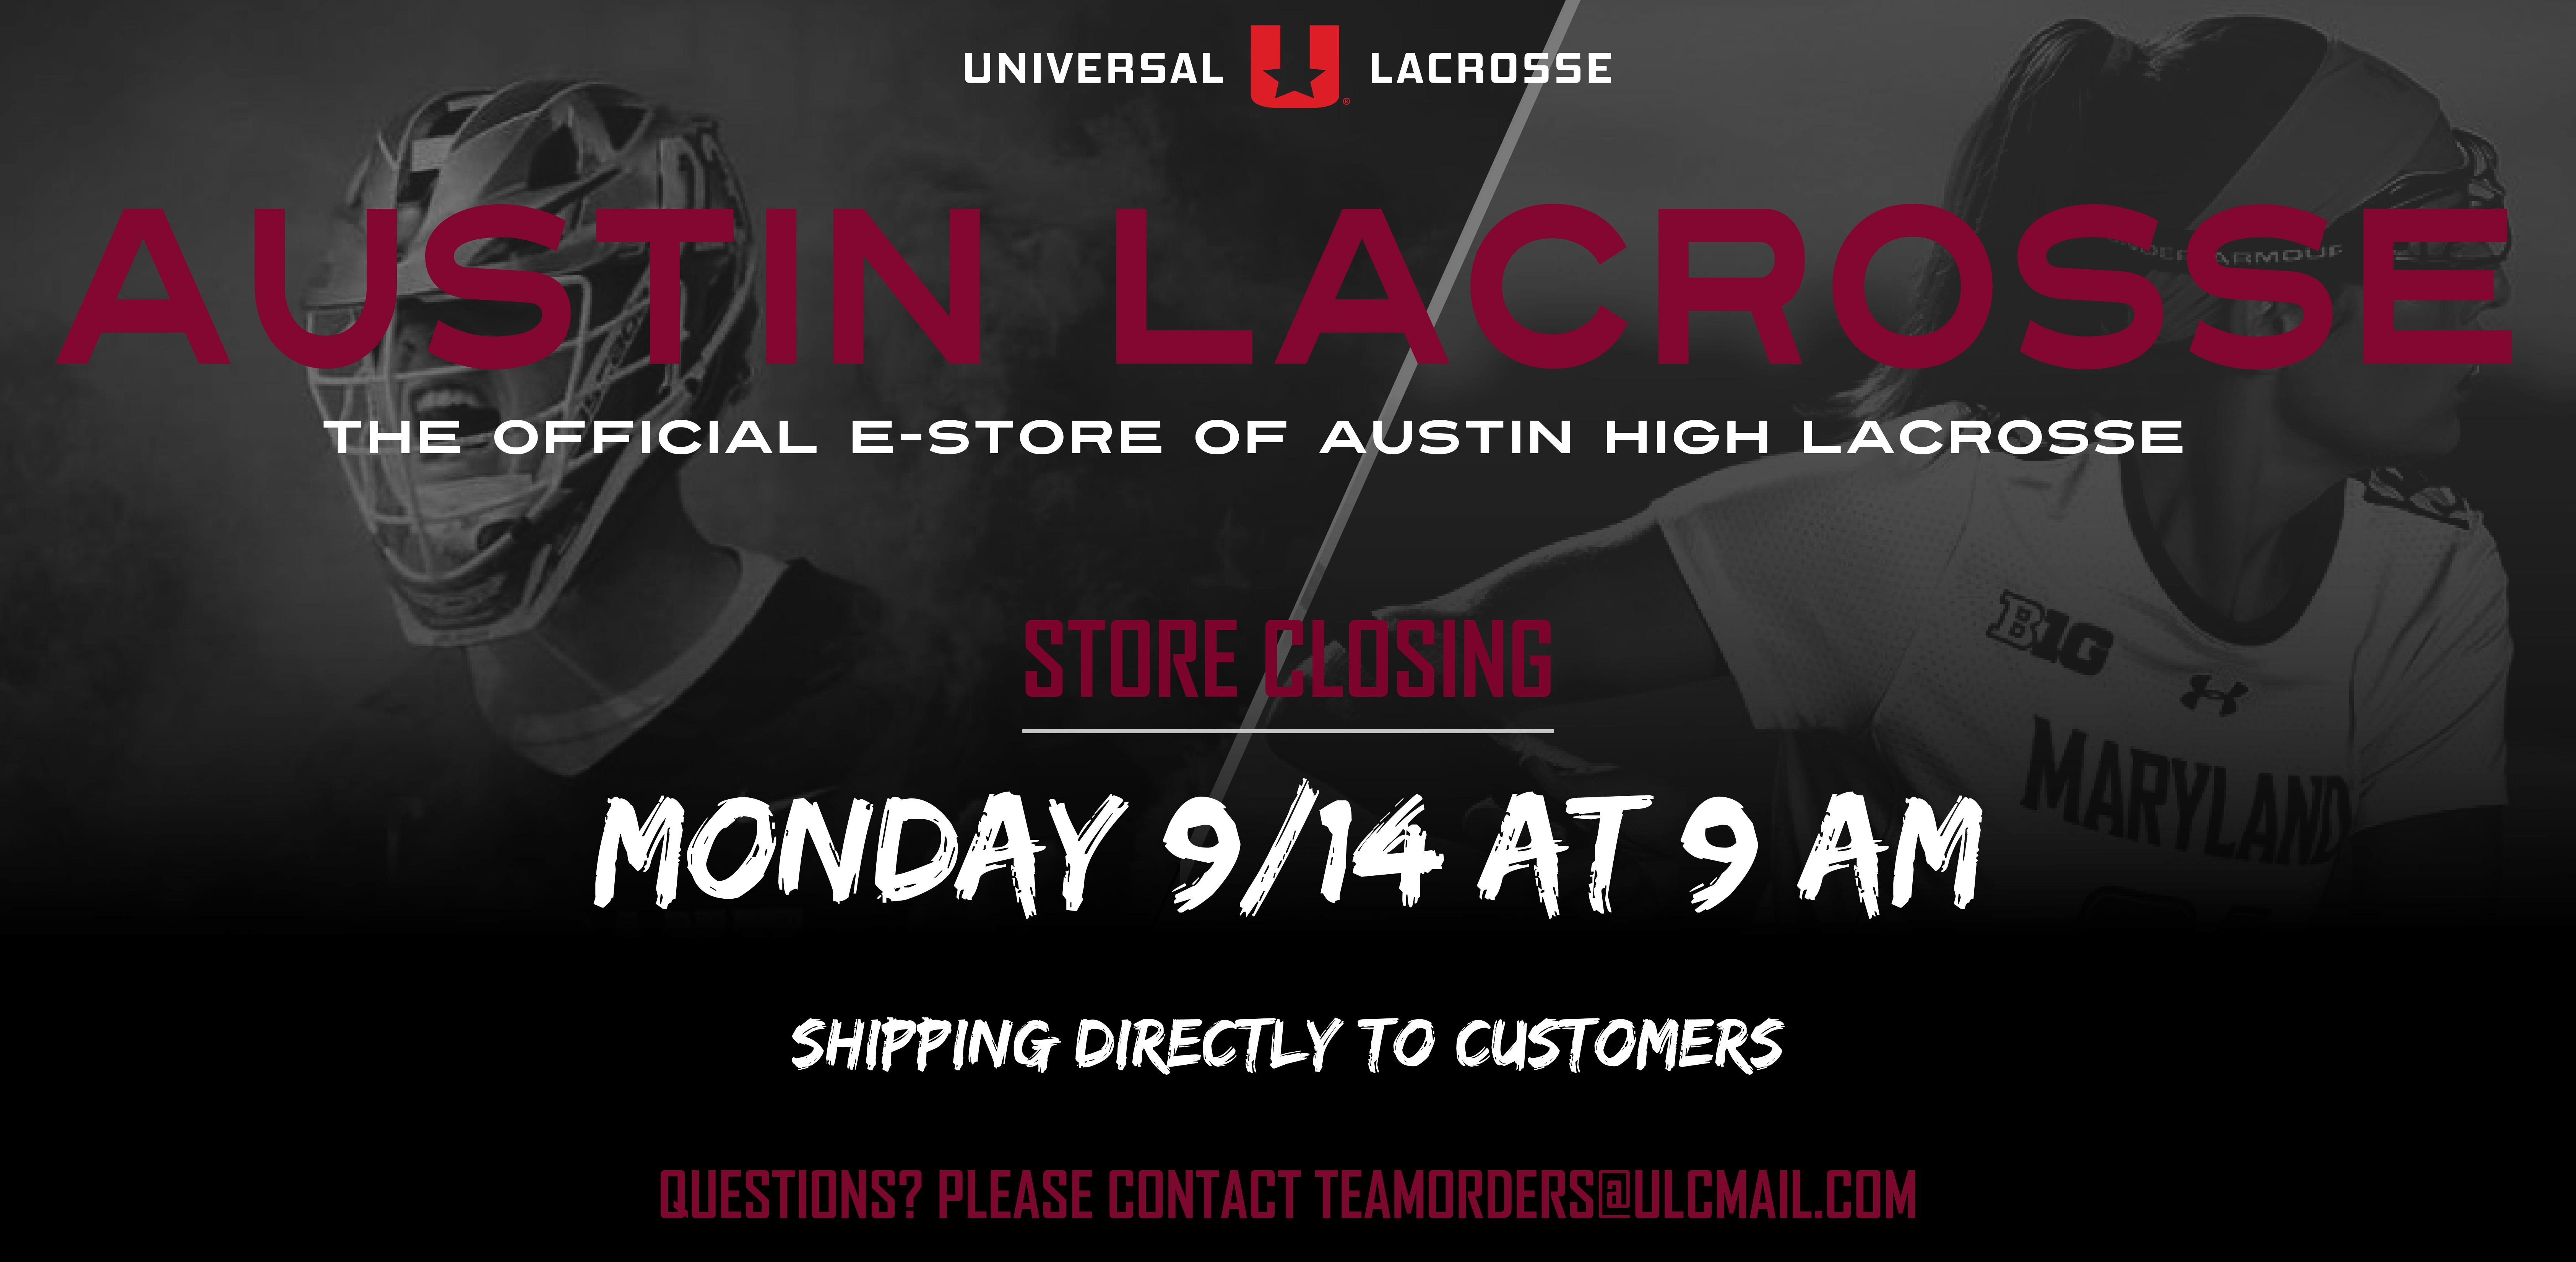 Austin High Lacrosse